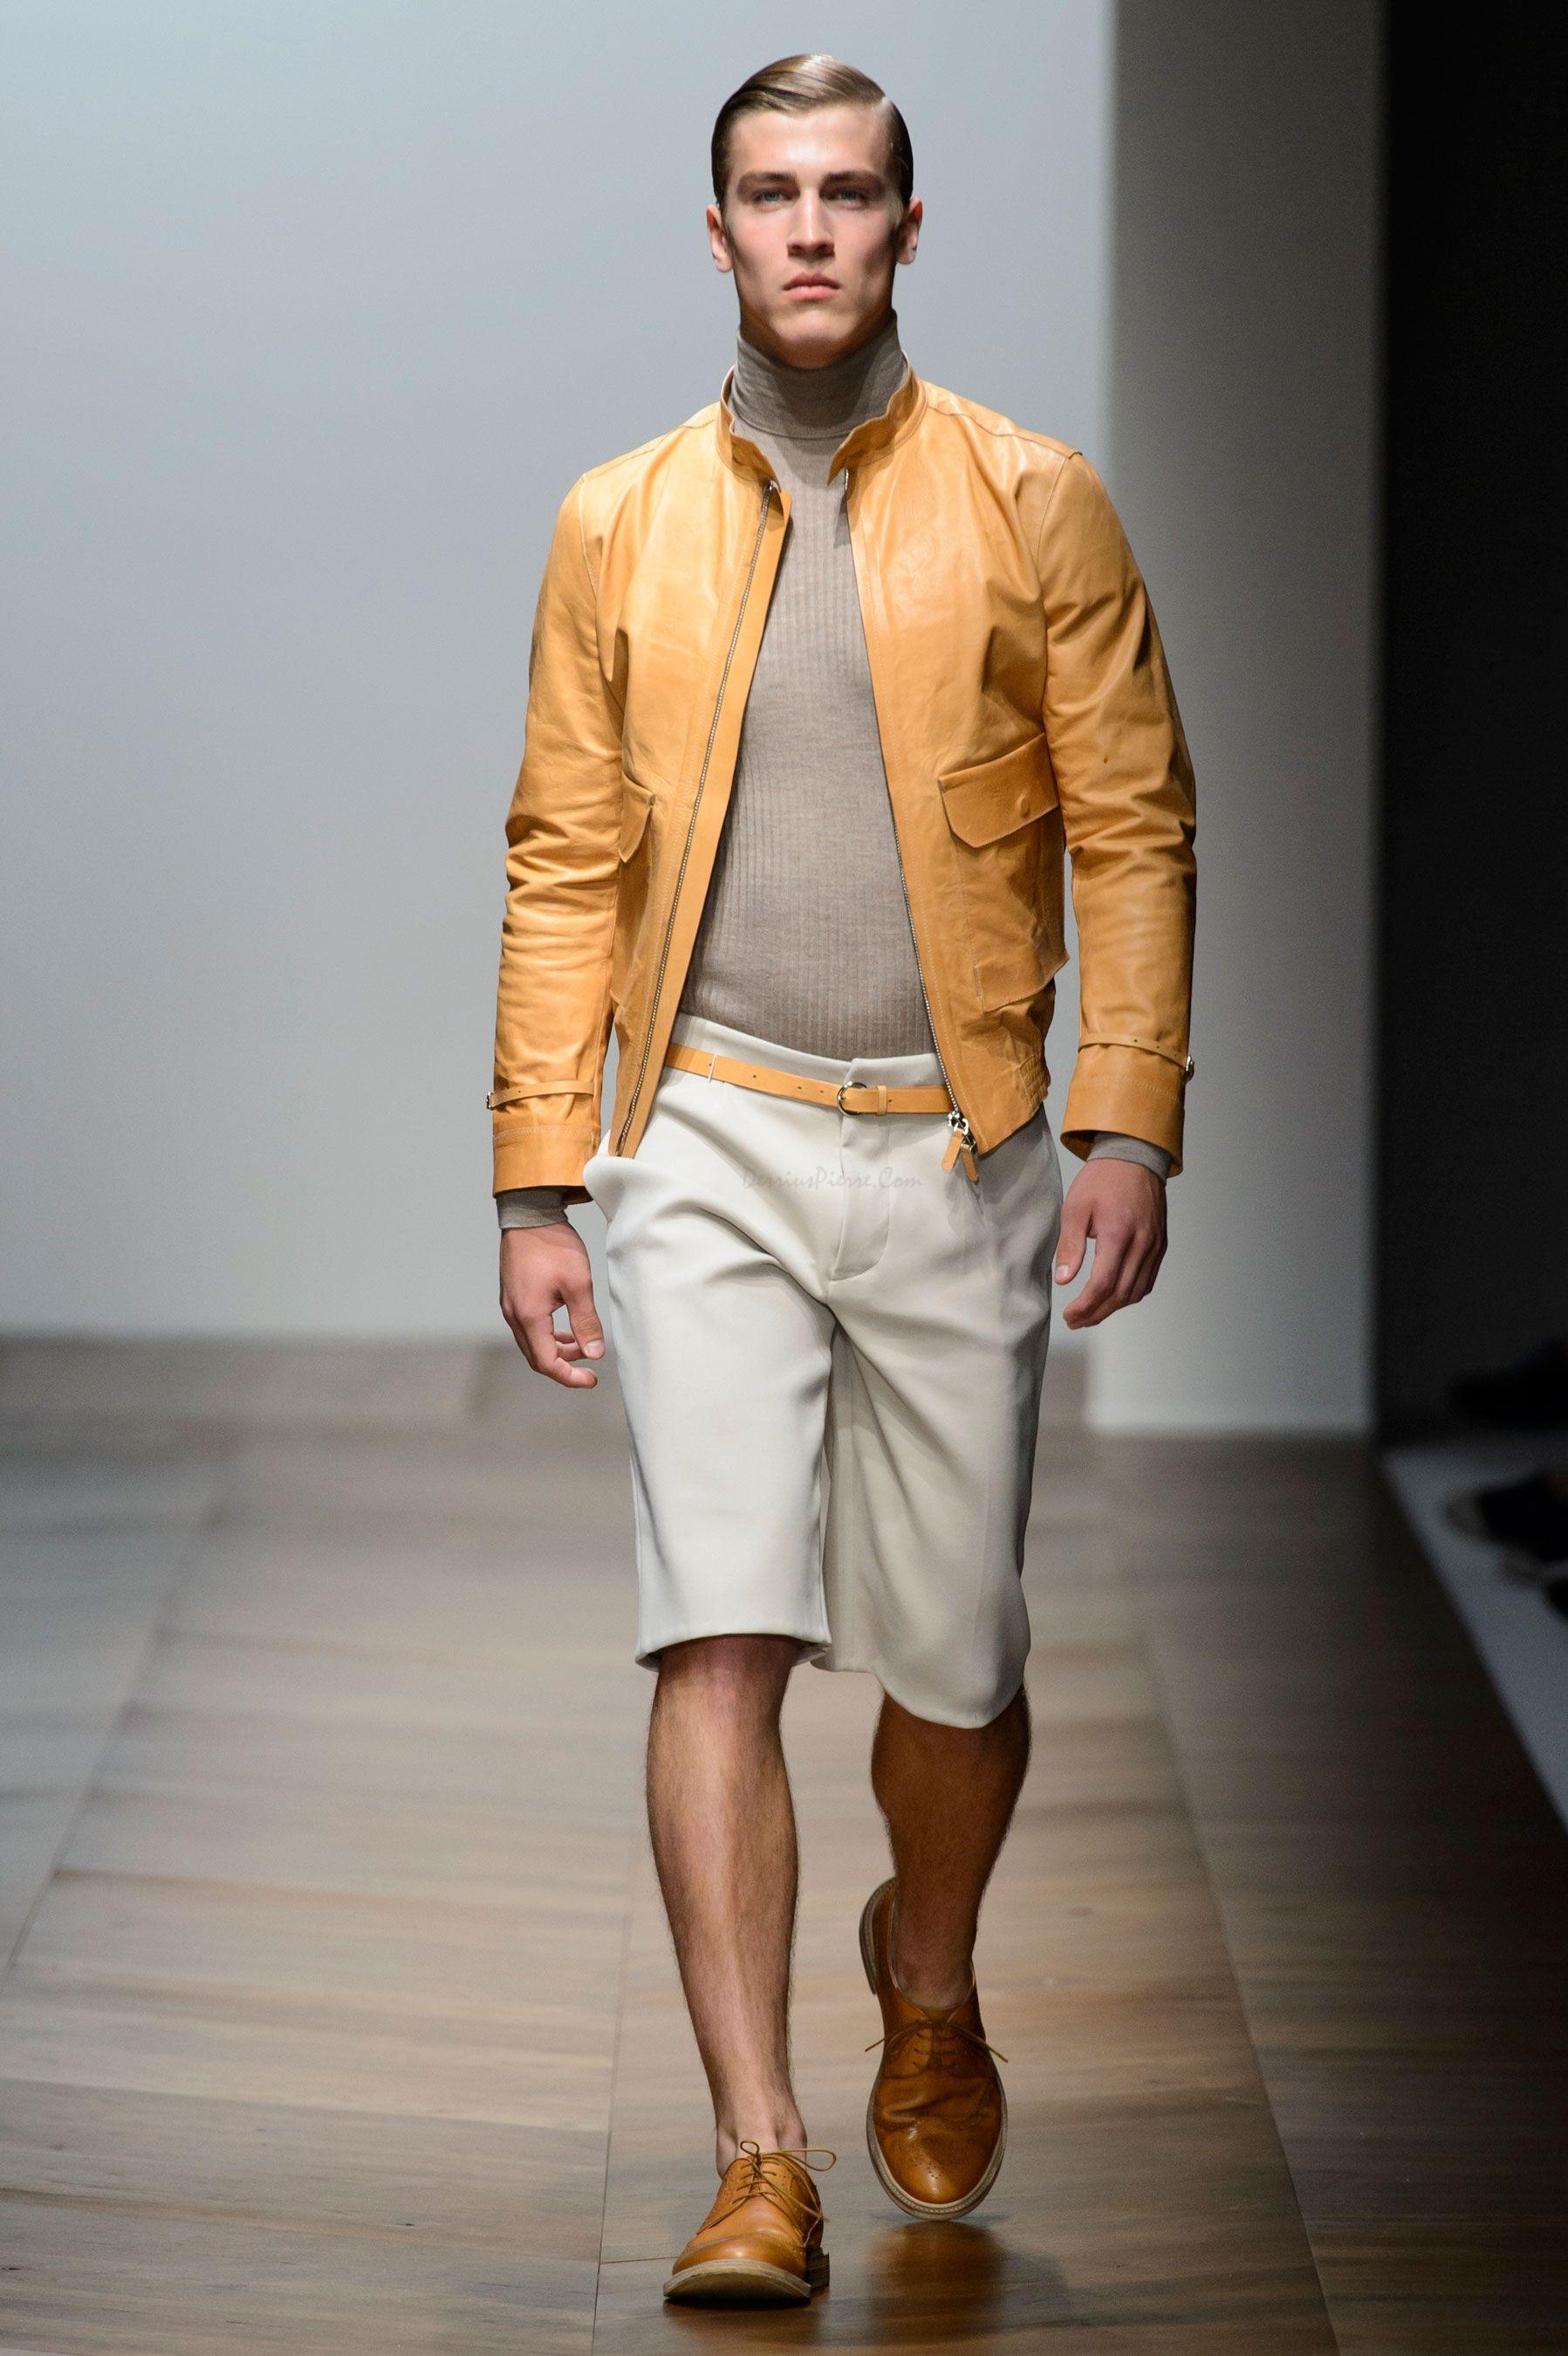 Daks Spring Summer 2016 Primavera Verano #Menswear #Trends #Tendencias #Moda Hombre - Milan Fashion Week - D.P.